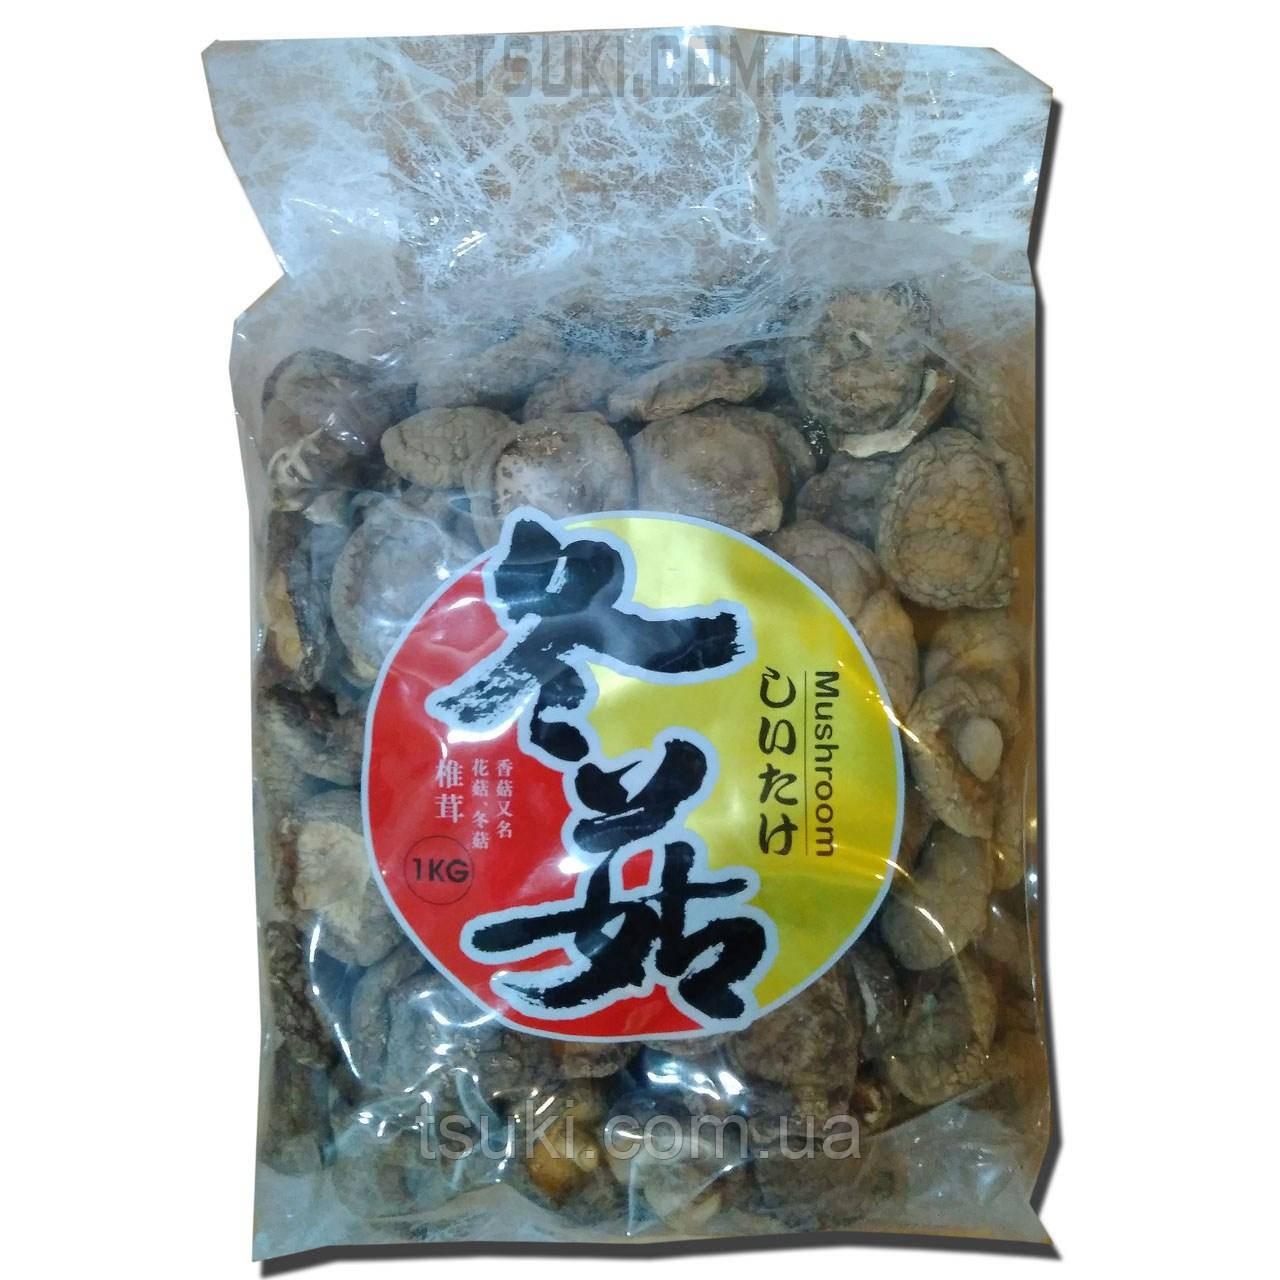 Сушеные грибы Шитаке 1кг.